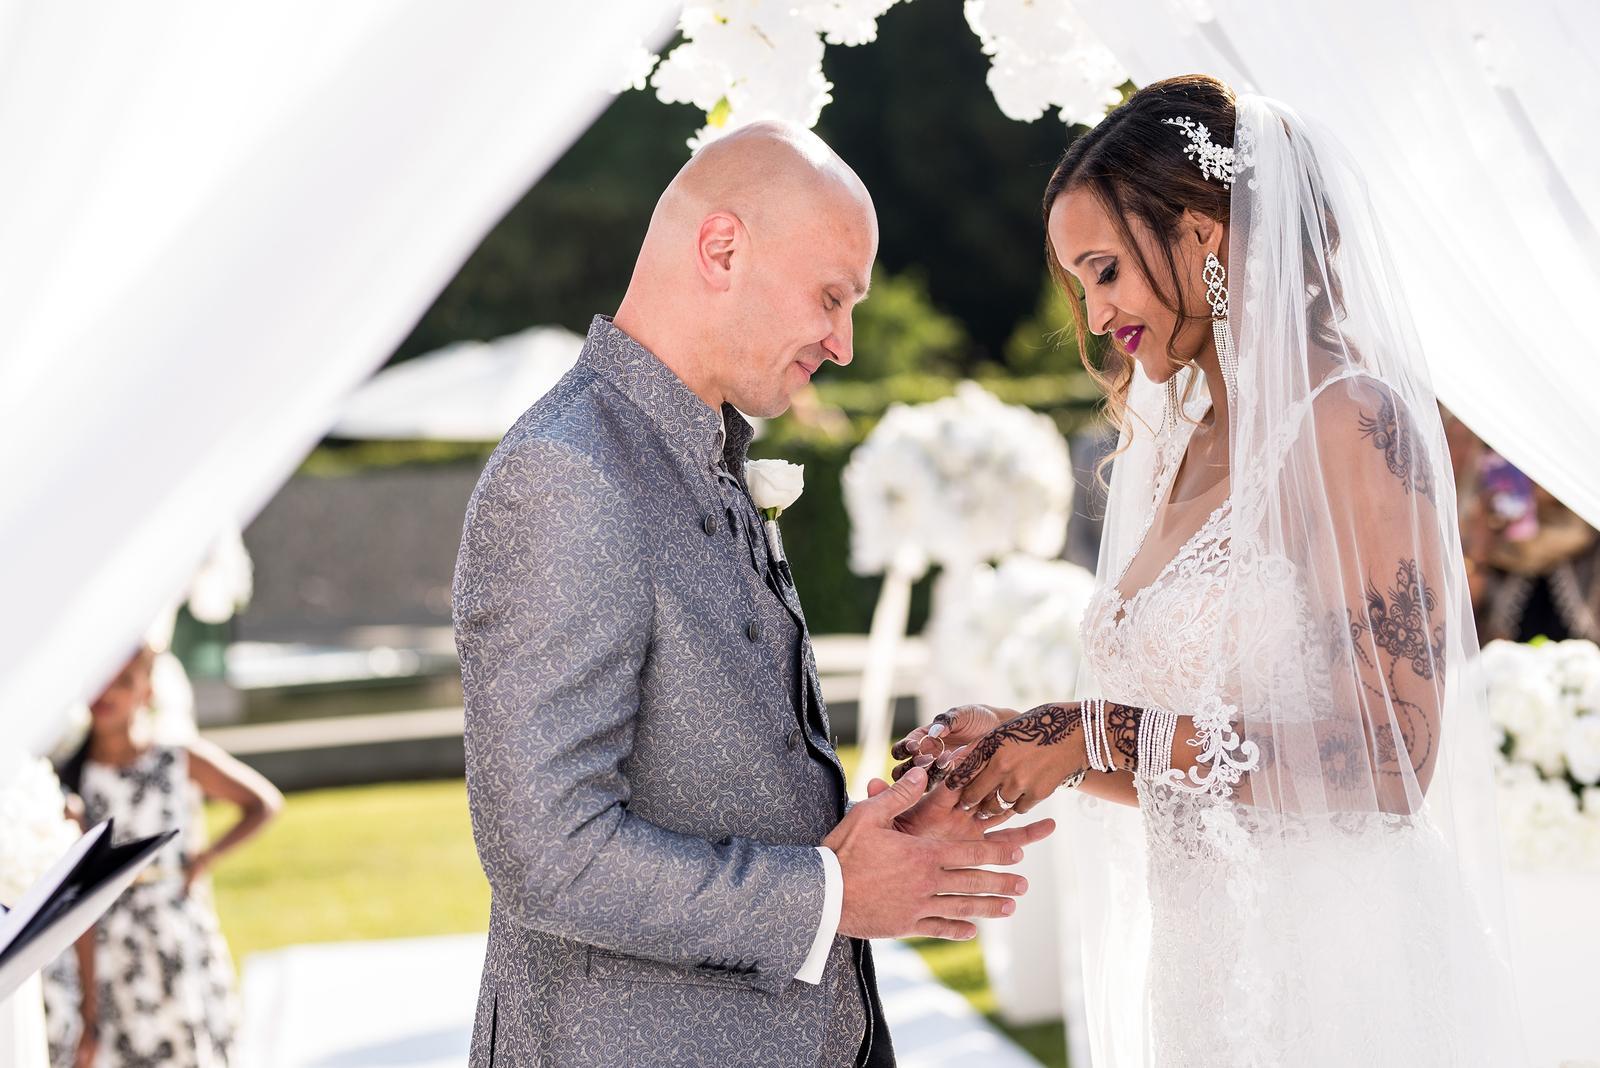 Svadba Zahra a Milan - Obrázok č. 42